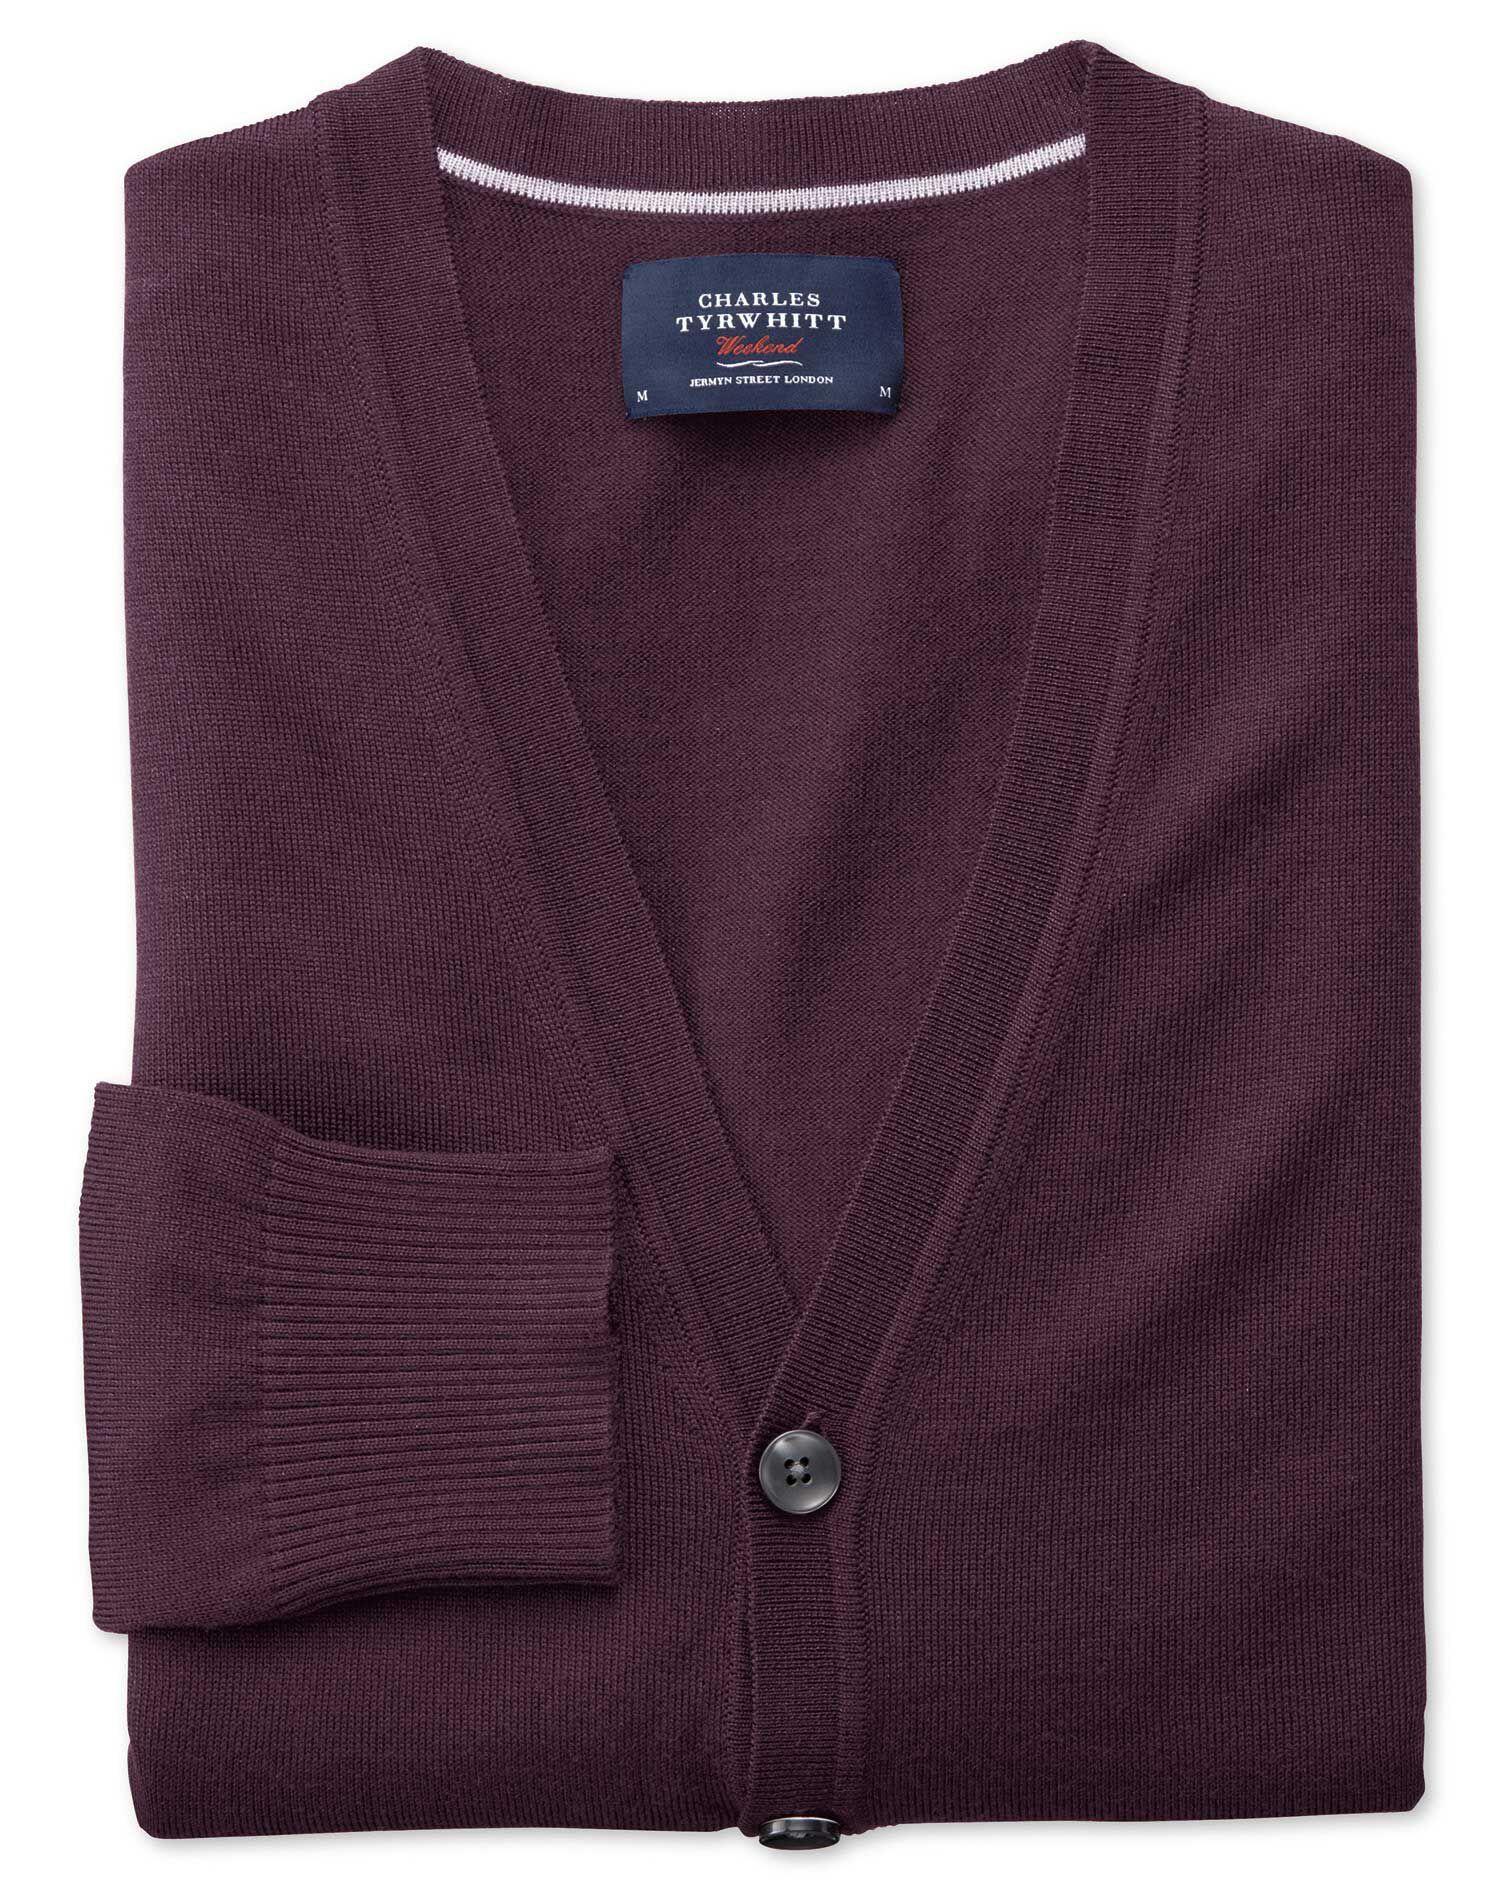 Wine Merino Wool Cardigan Size Large by Charles Tyrwhitt